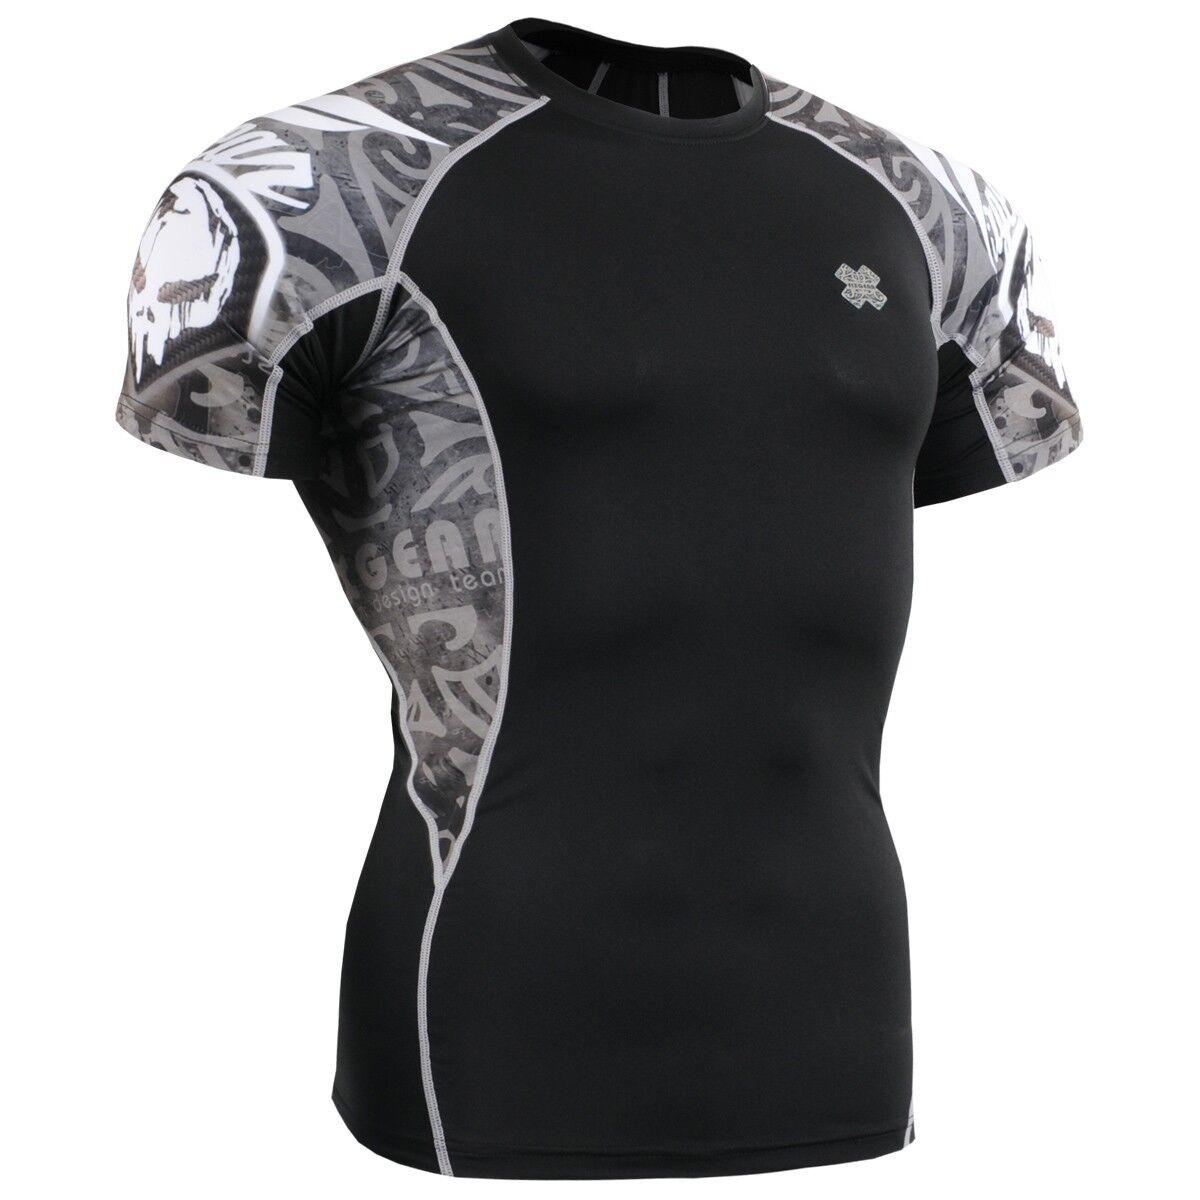 FIXGEAR C2S-B43 Compression Base Layer Workout Shirt Sportswear Gym MMA